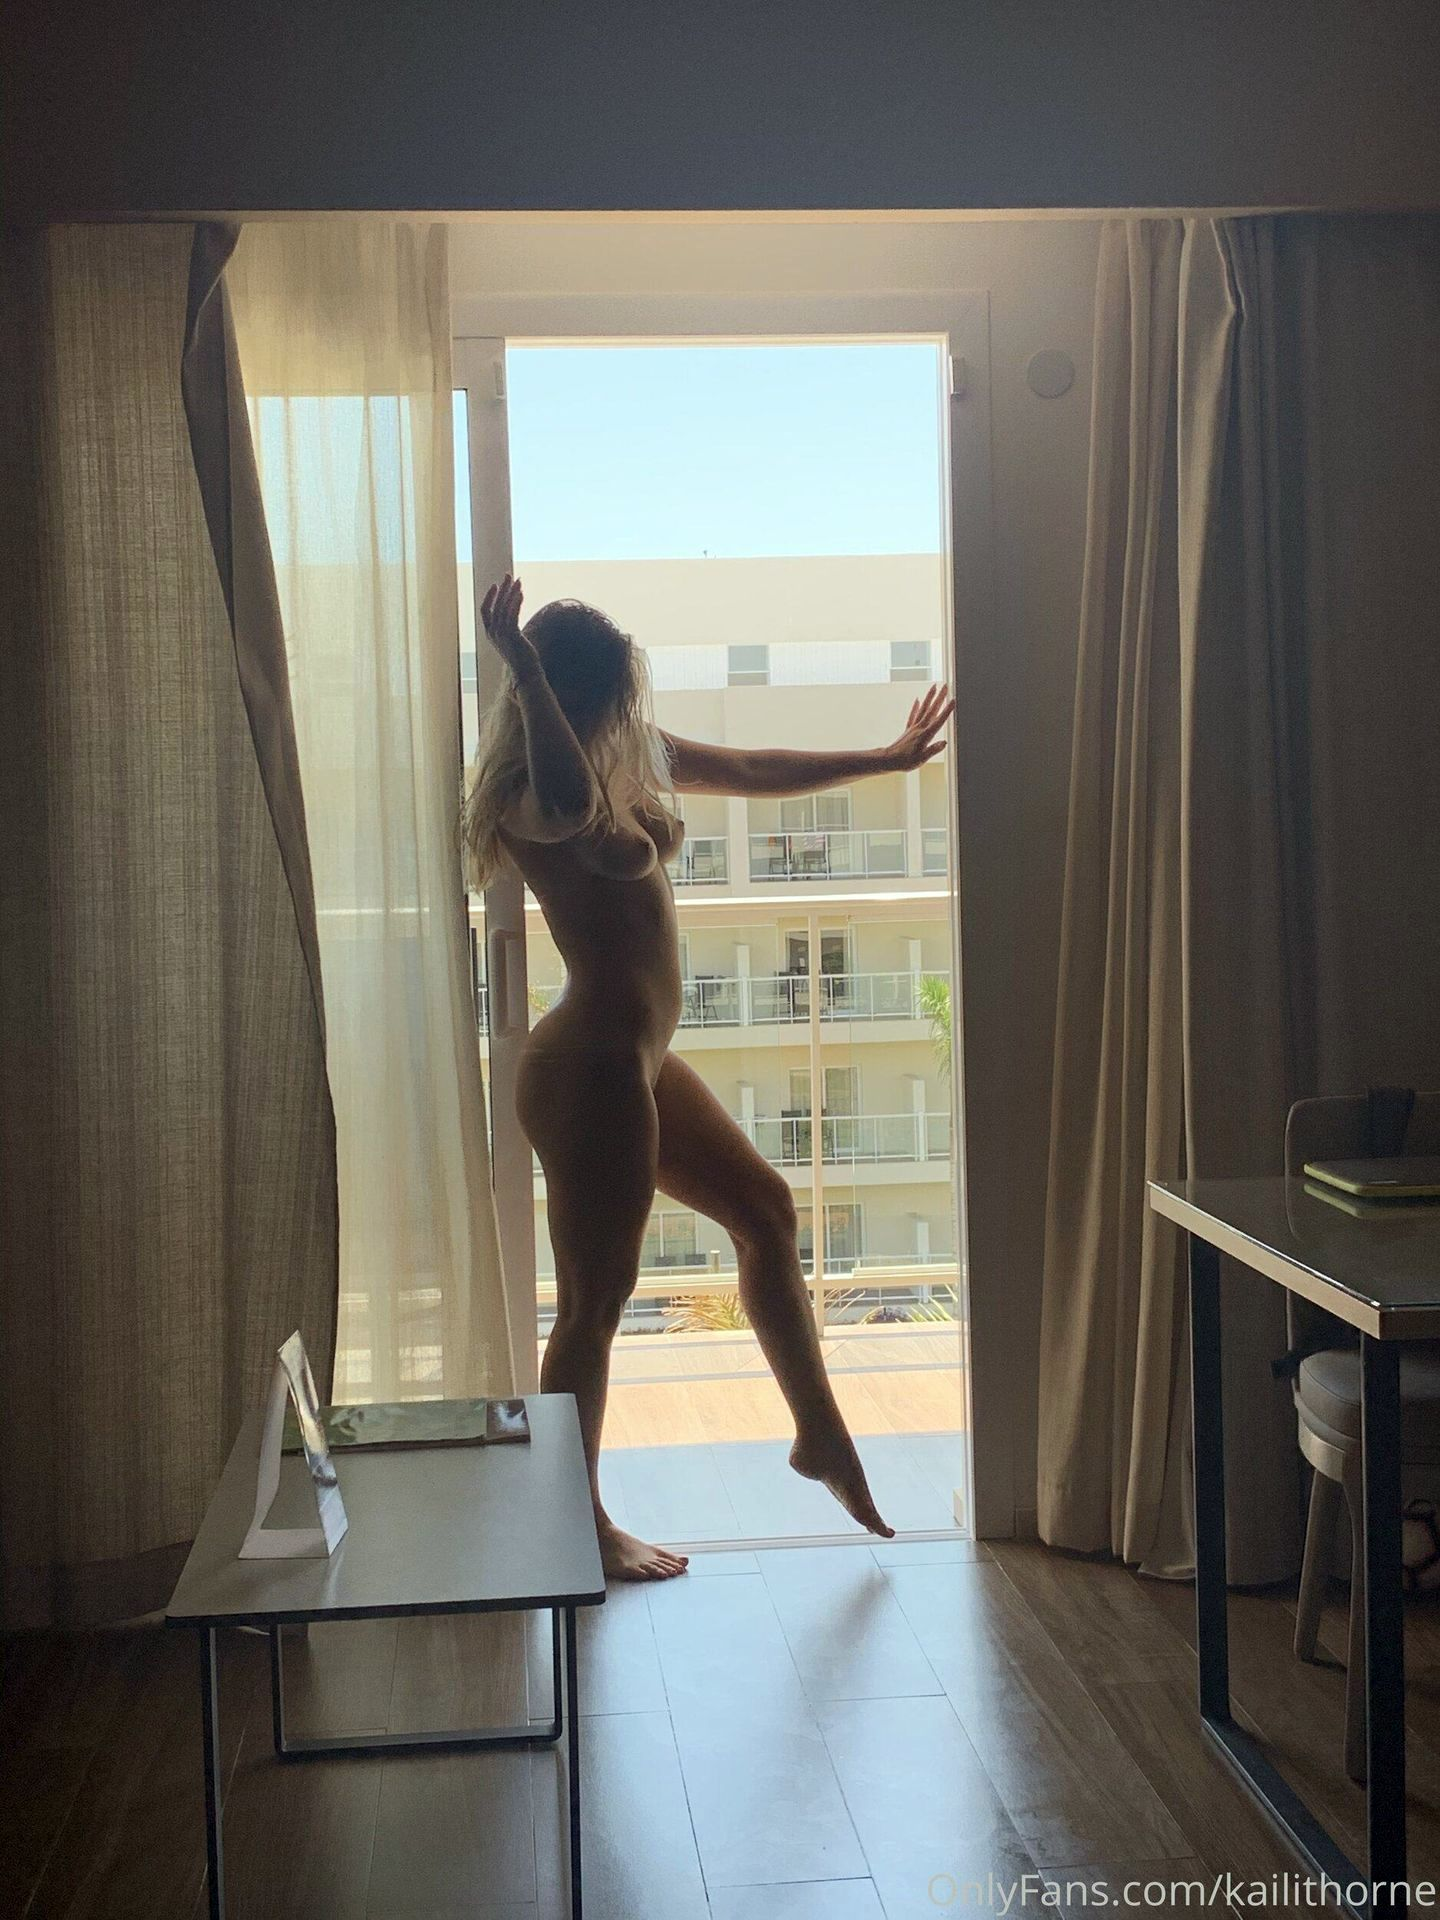 Kaili Thorne nude masturbation video and blowjob photos leaked